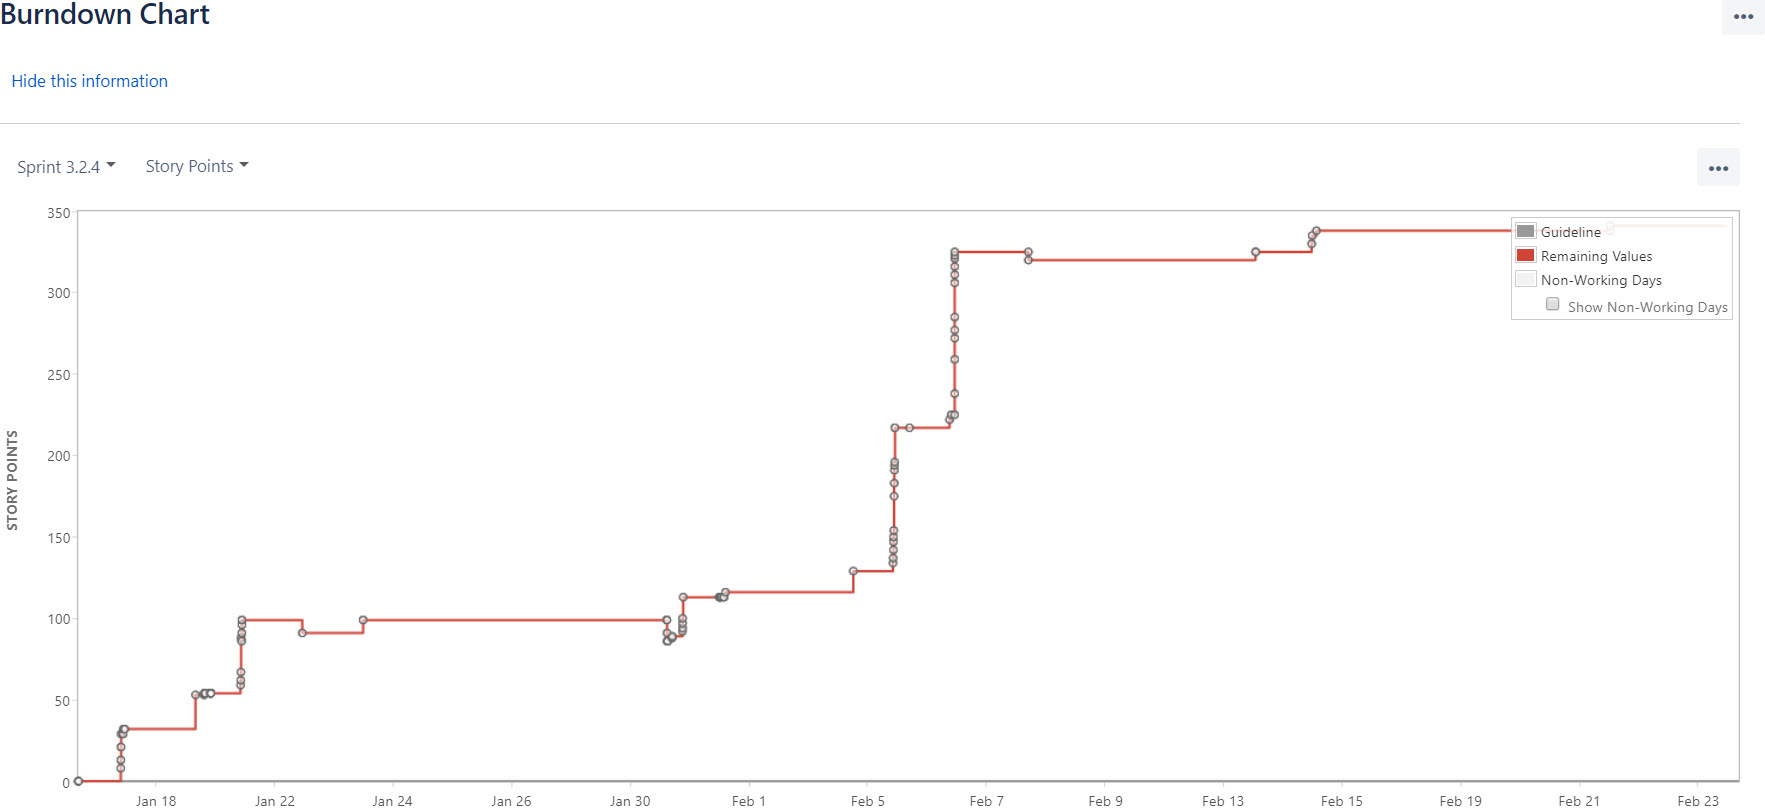 burn down chart not showing progress